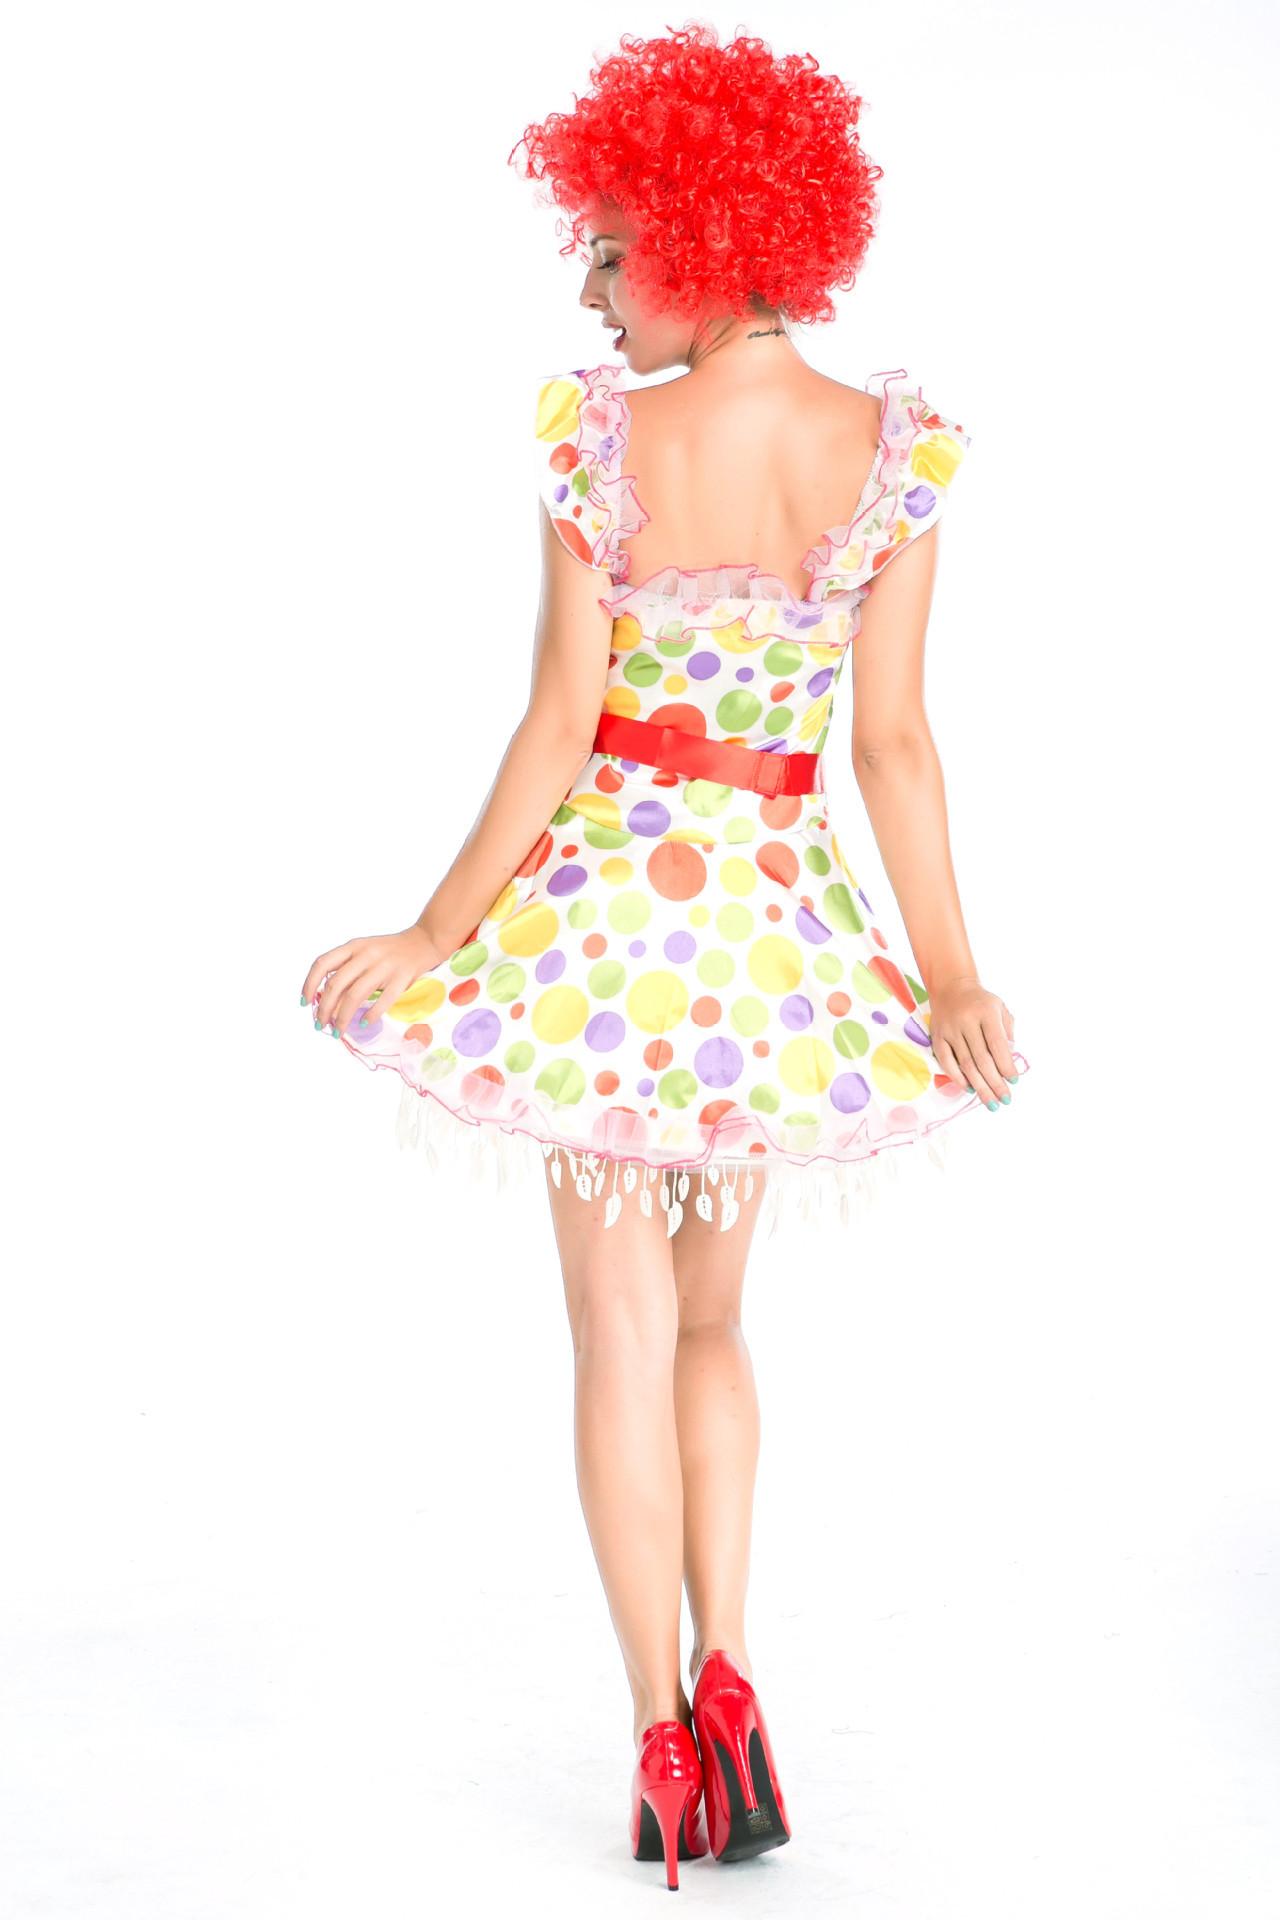 Wig cartoon costume circus clown role play costume Dinis cosplay costume Halloween Costume